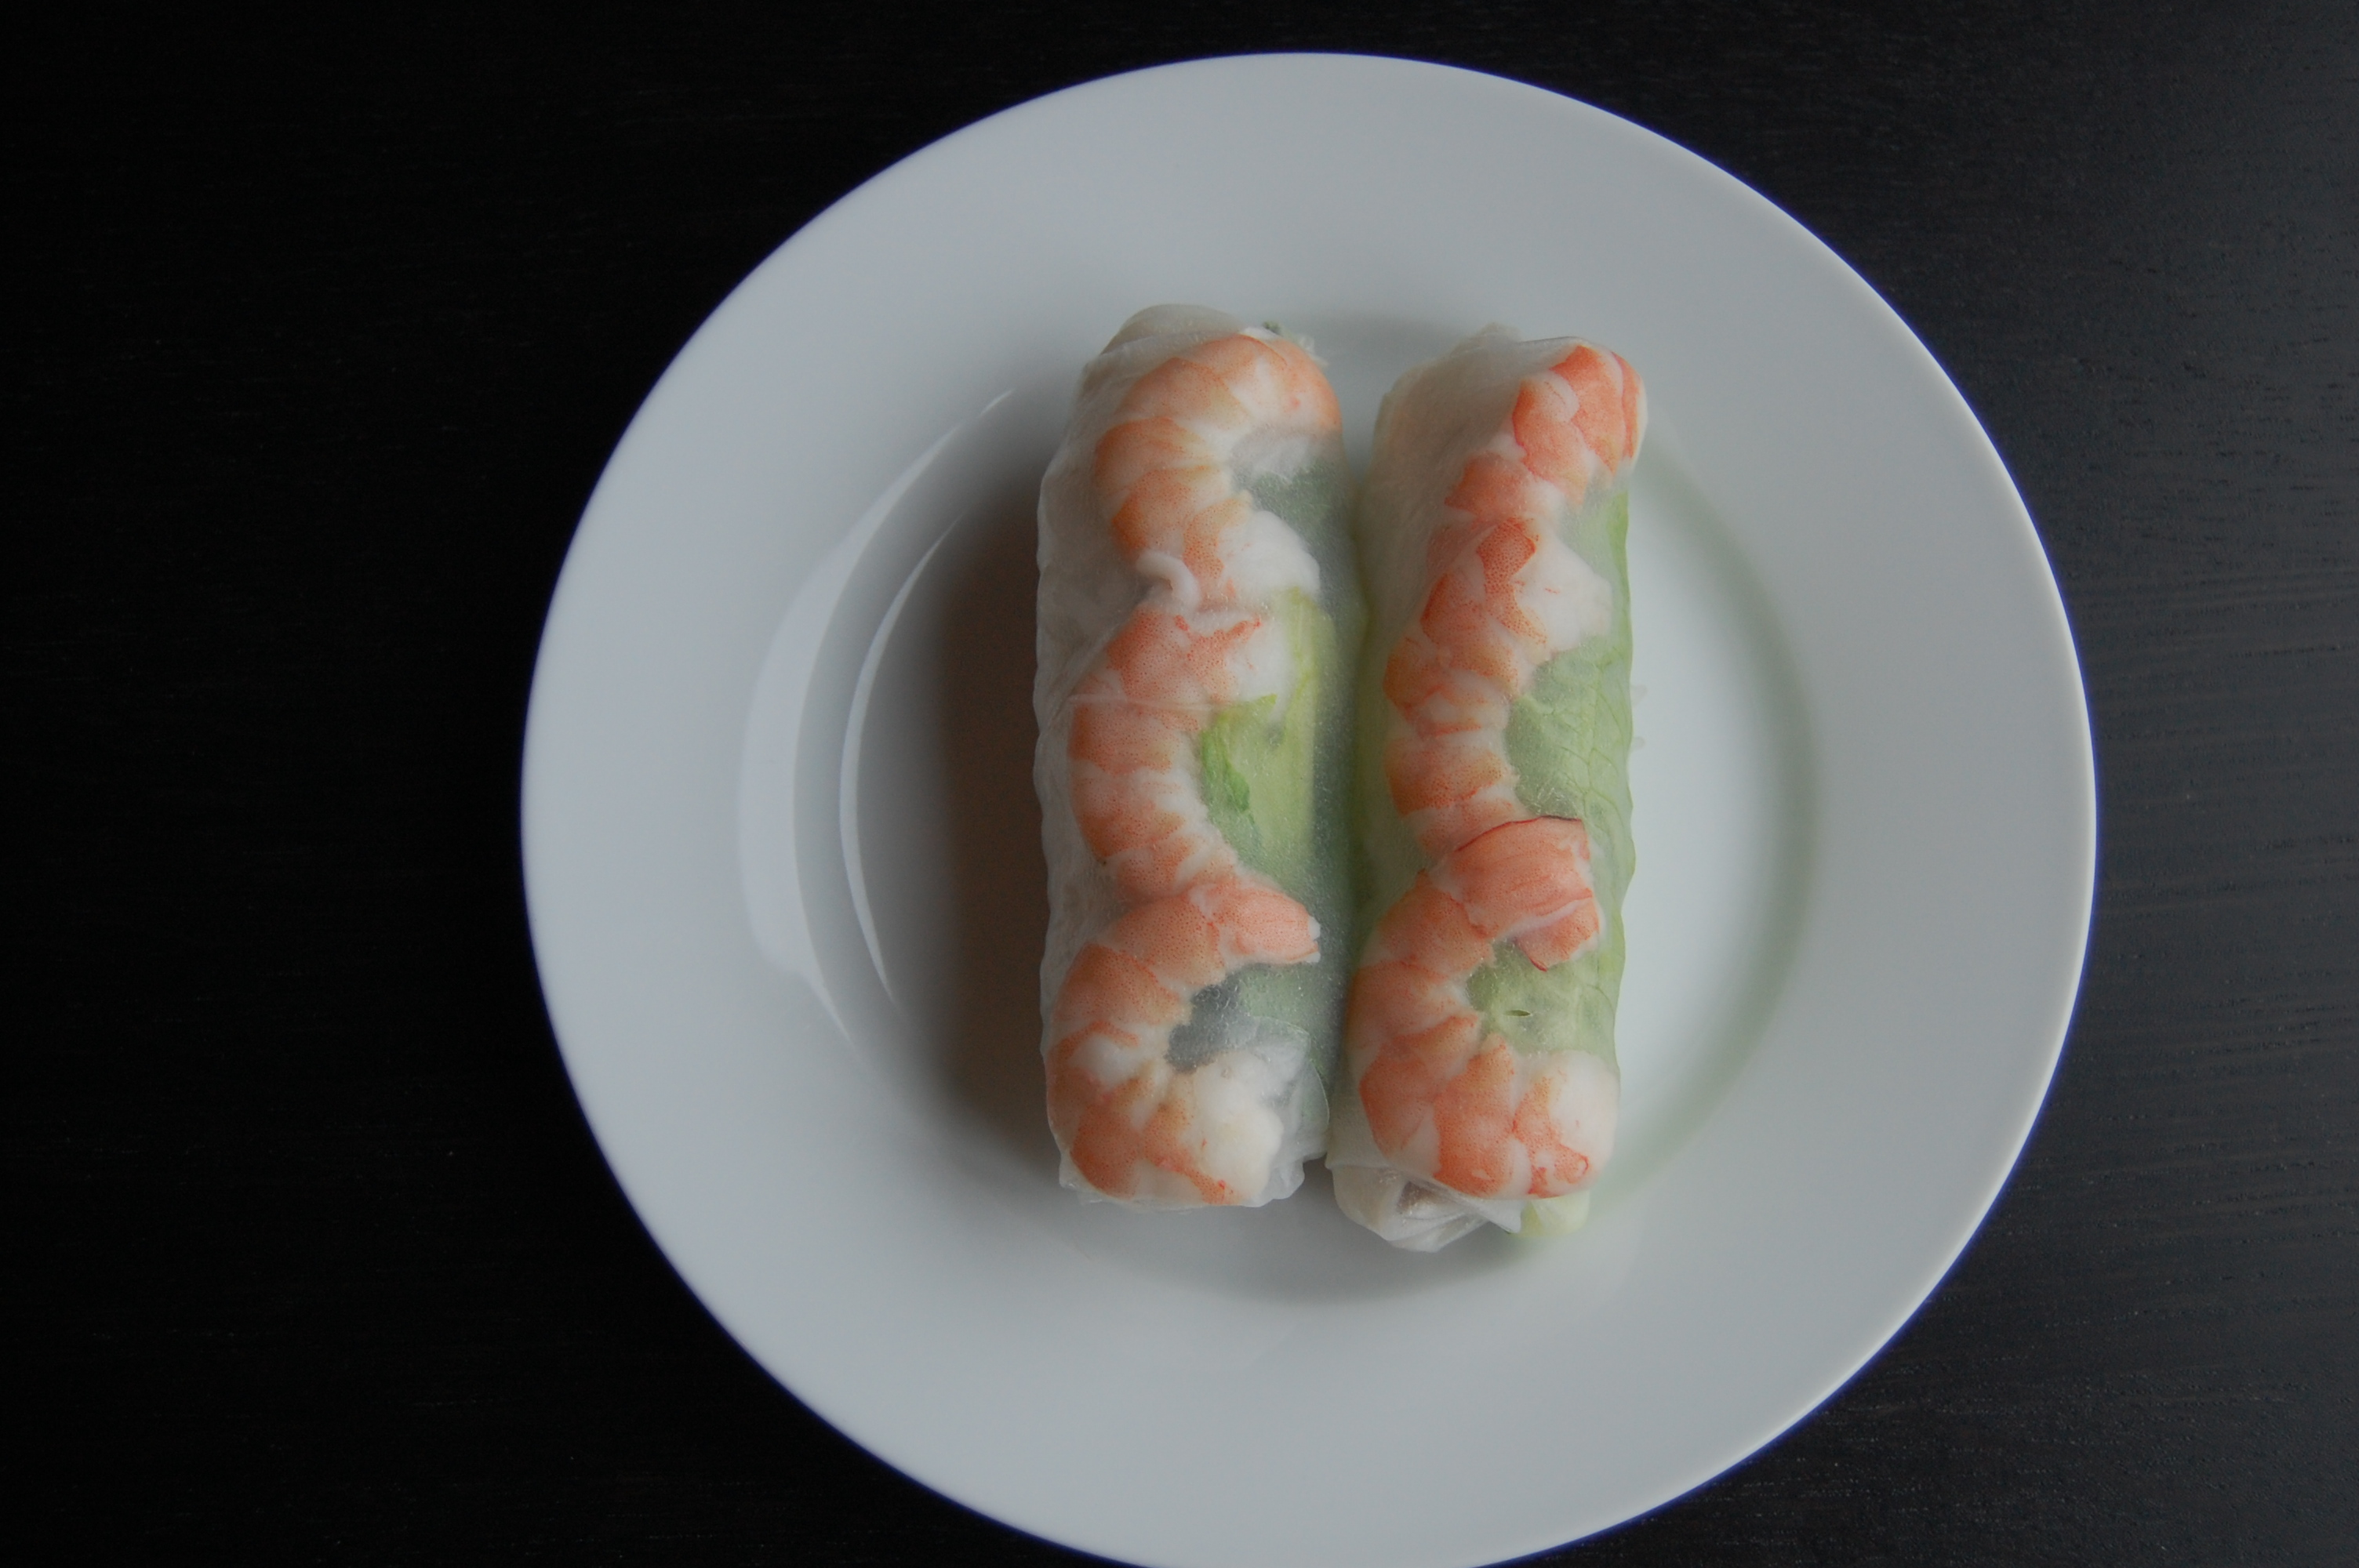 Friday was Summer Roll (goi cuon) night, pork and shrimp veggie rolls ...